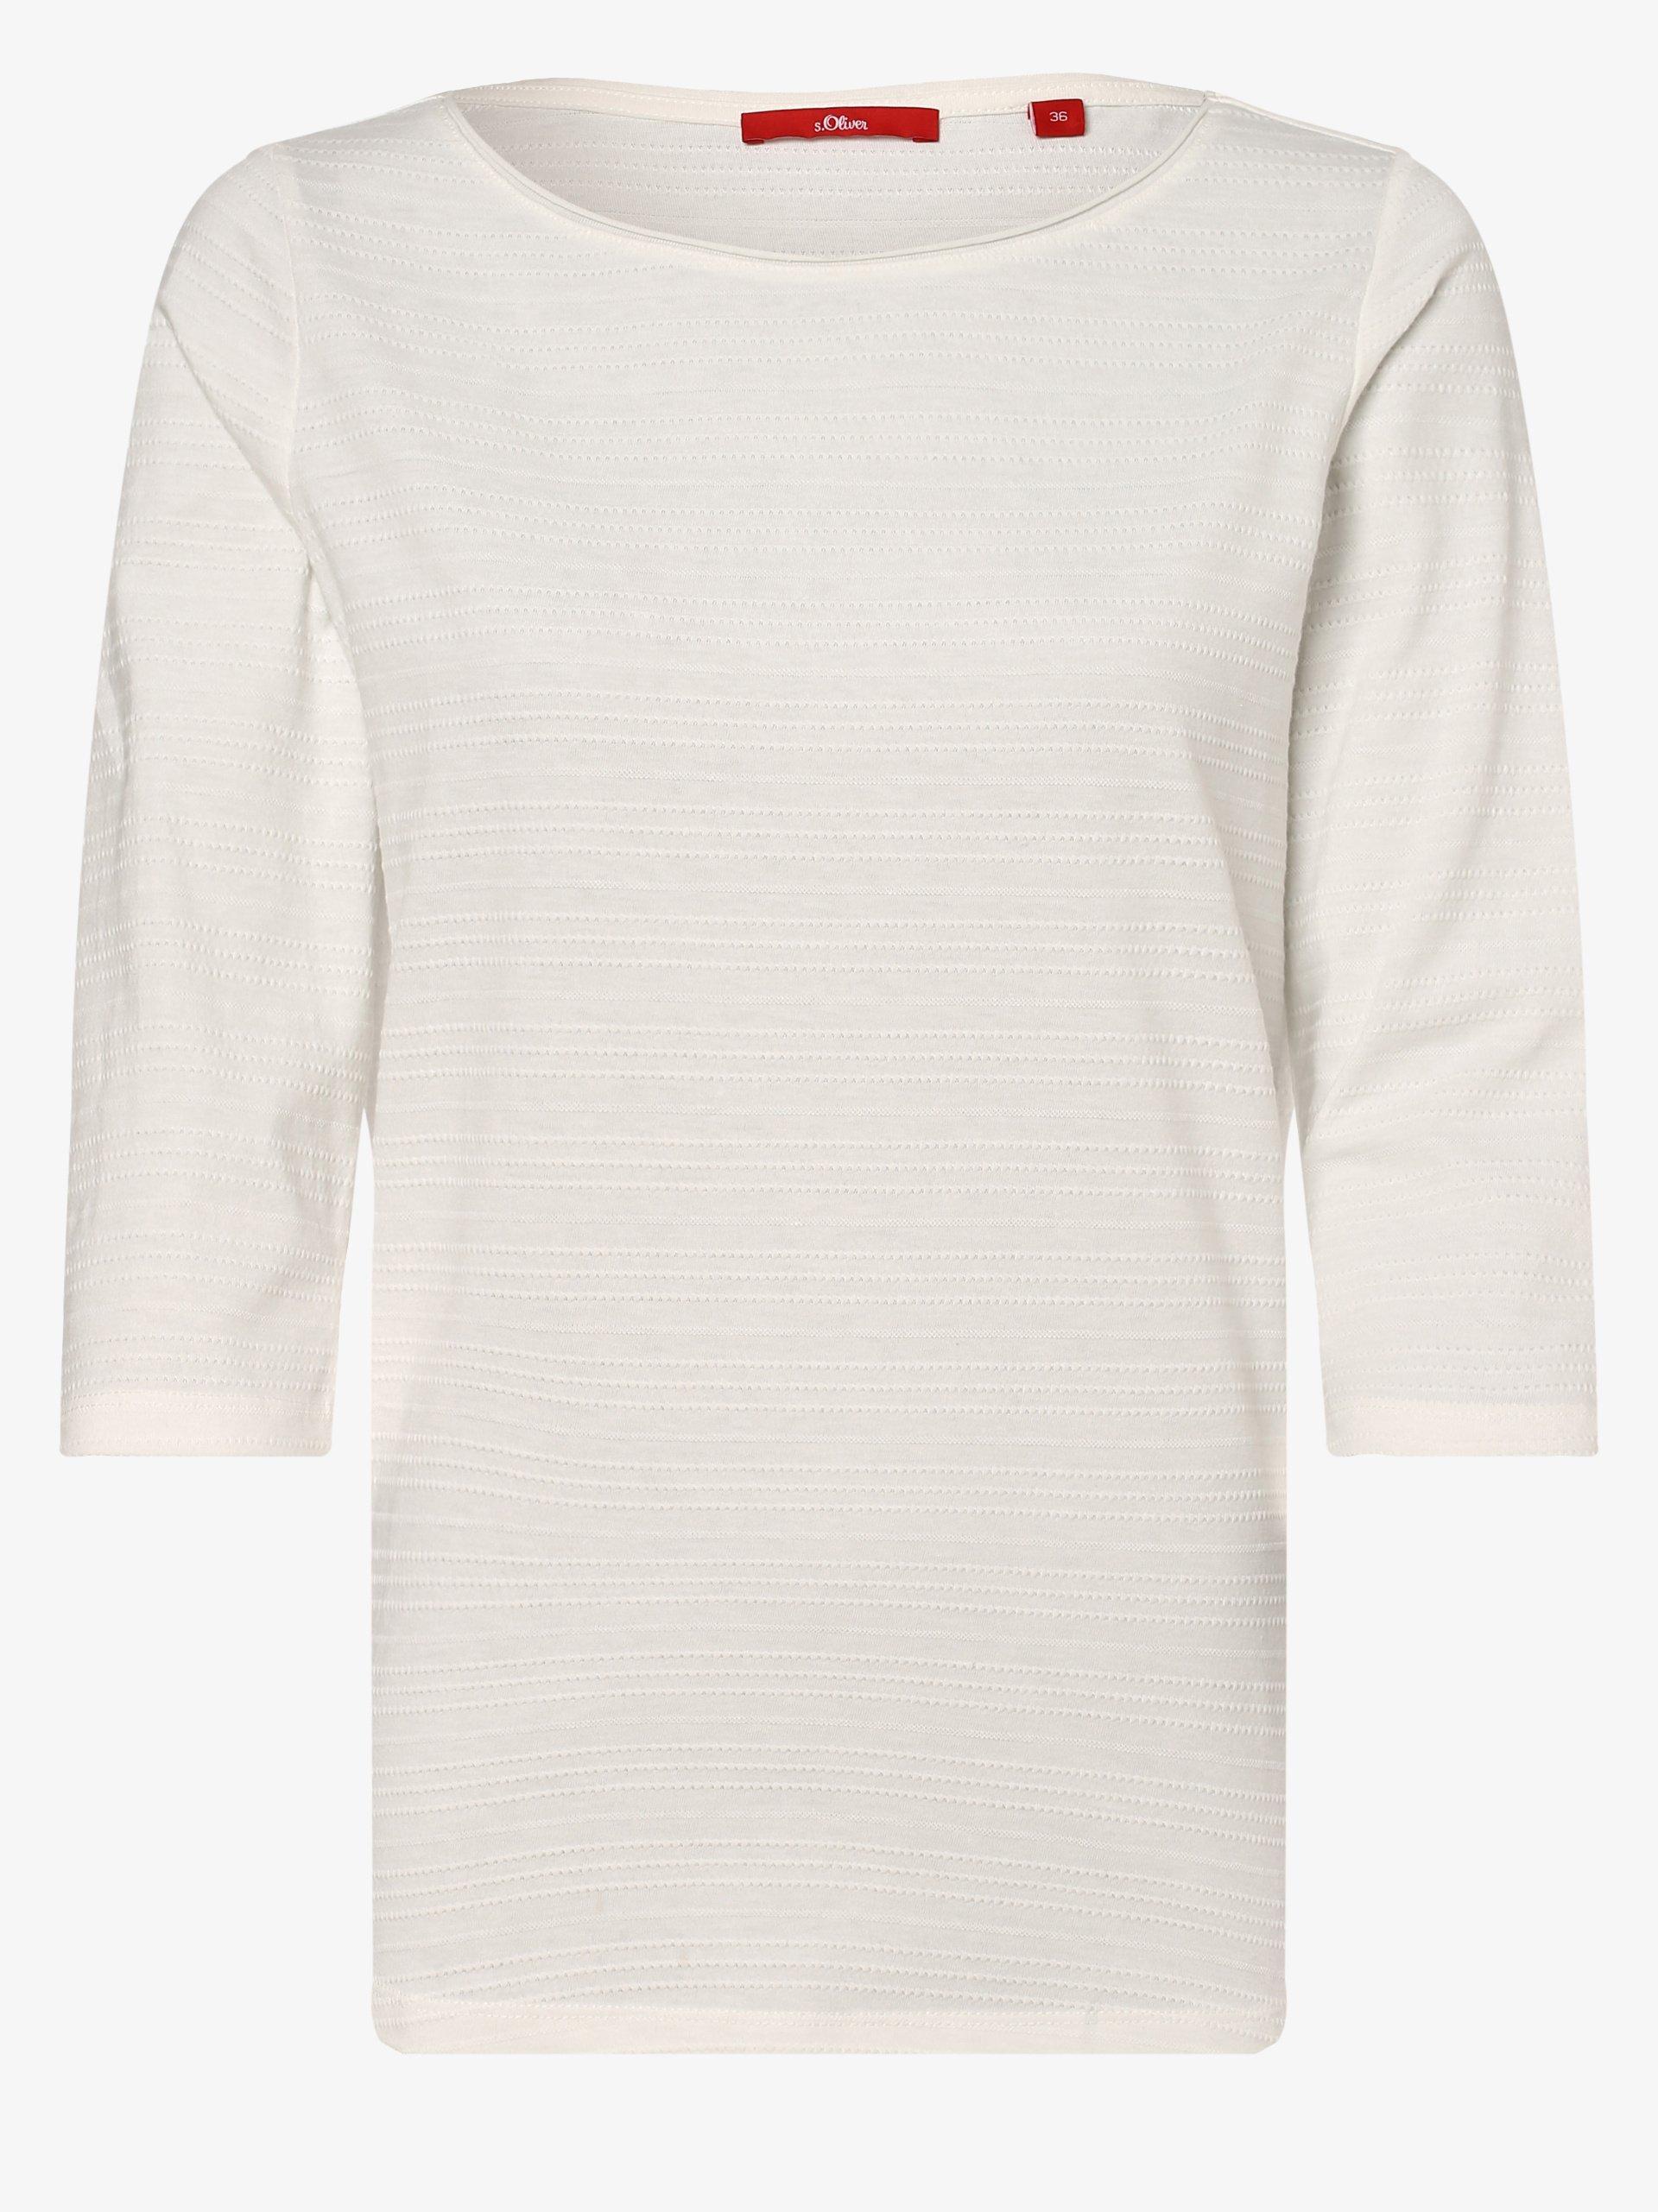 s.Oliver Casual Damen Shirt